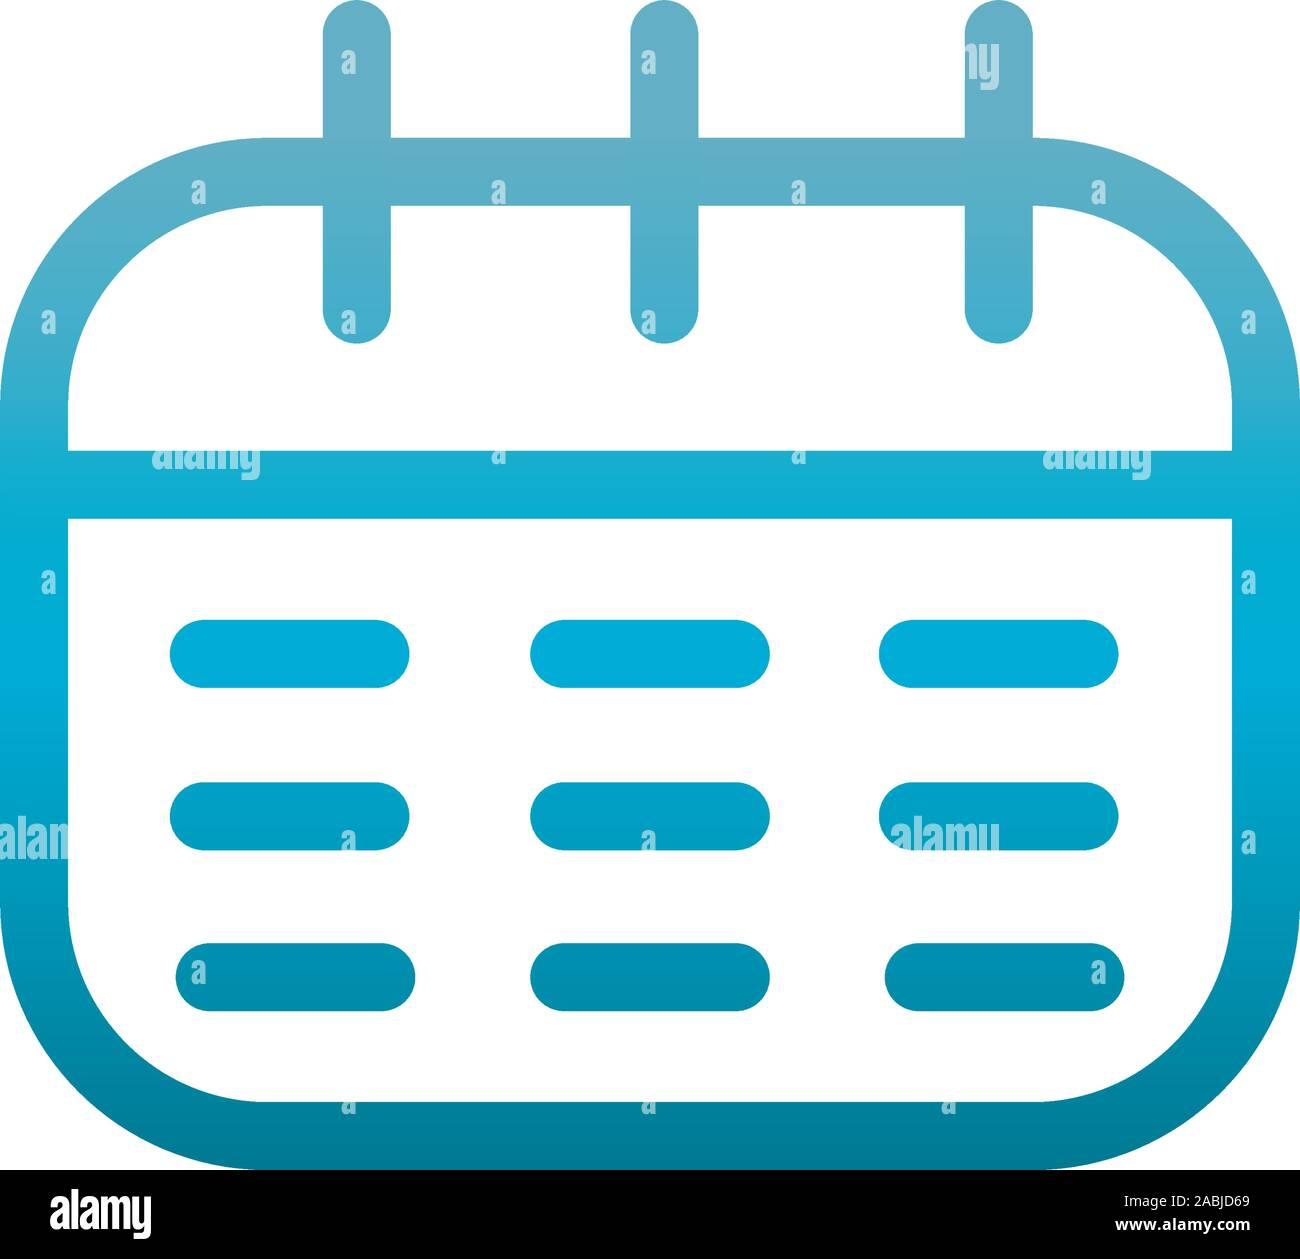 calendar plan user interface blue gradient vector illustration Stock Vector